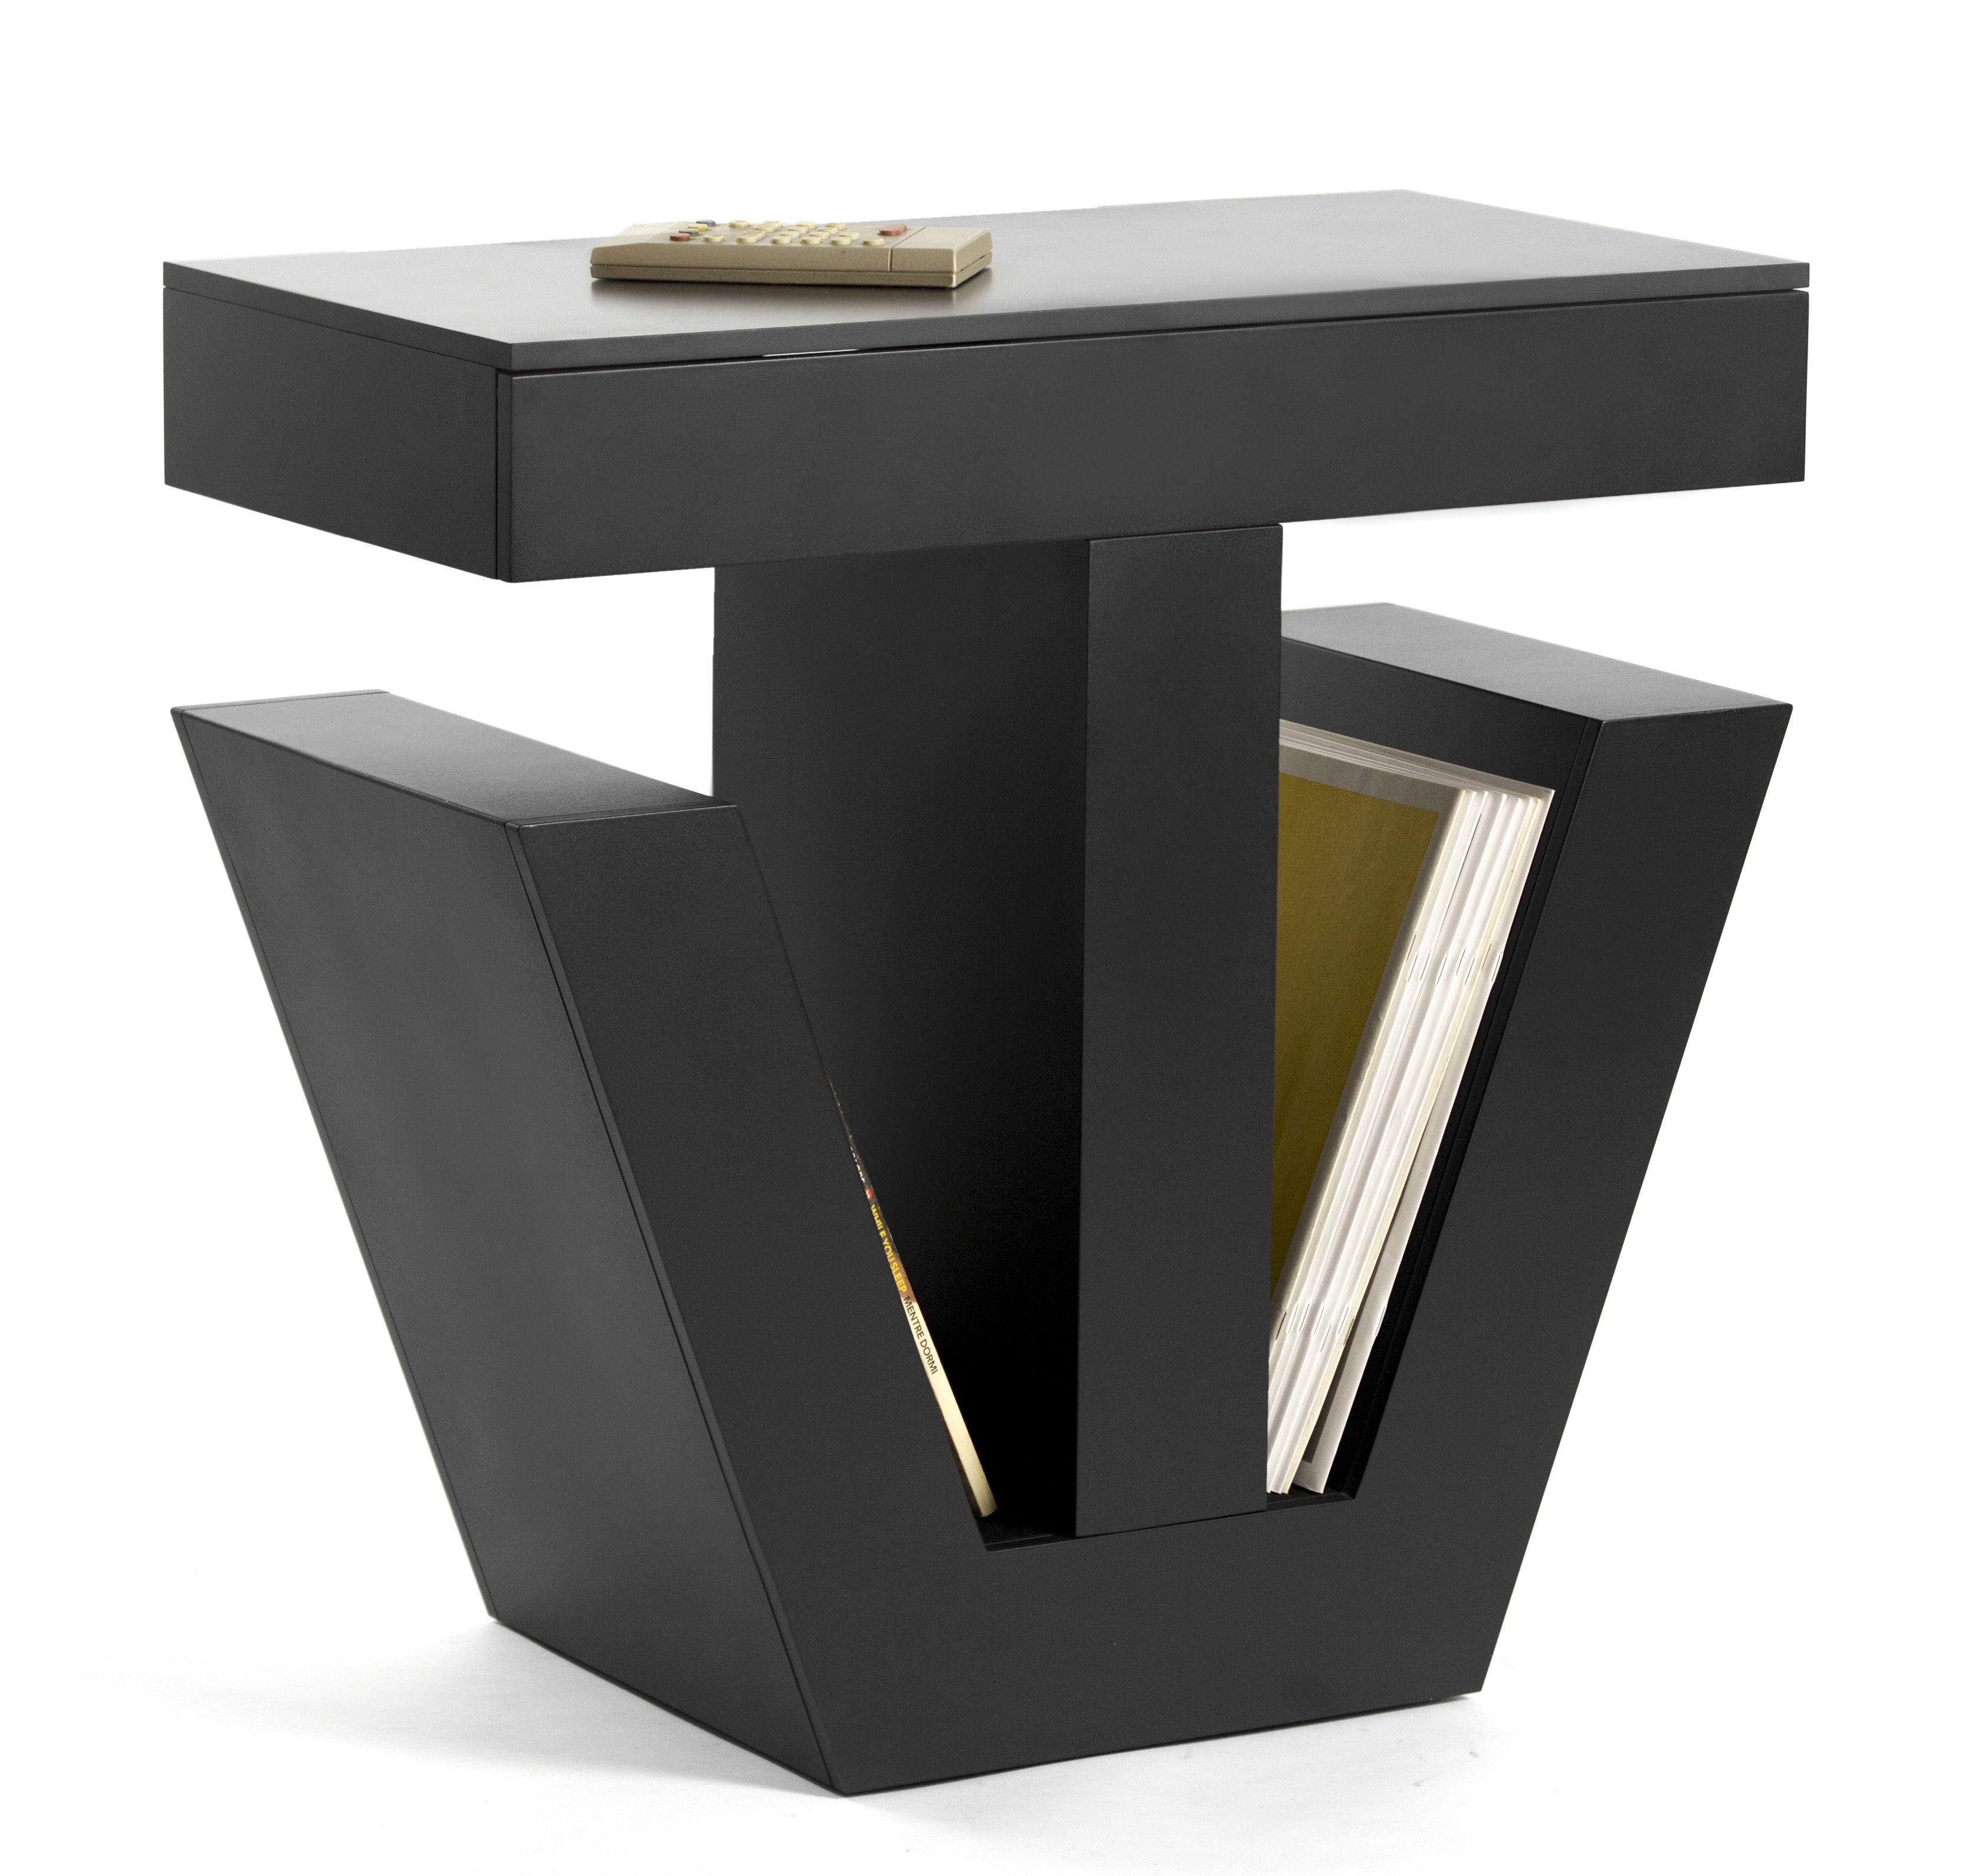 Meuble tv tiv r dition 1992 noir internoitaliano for Reedition meuble design